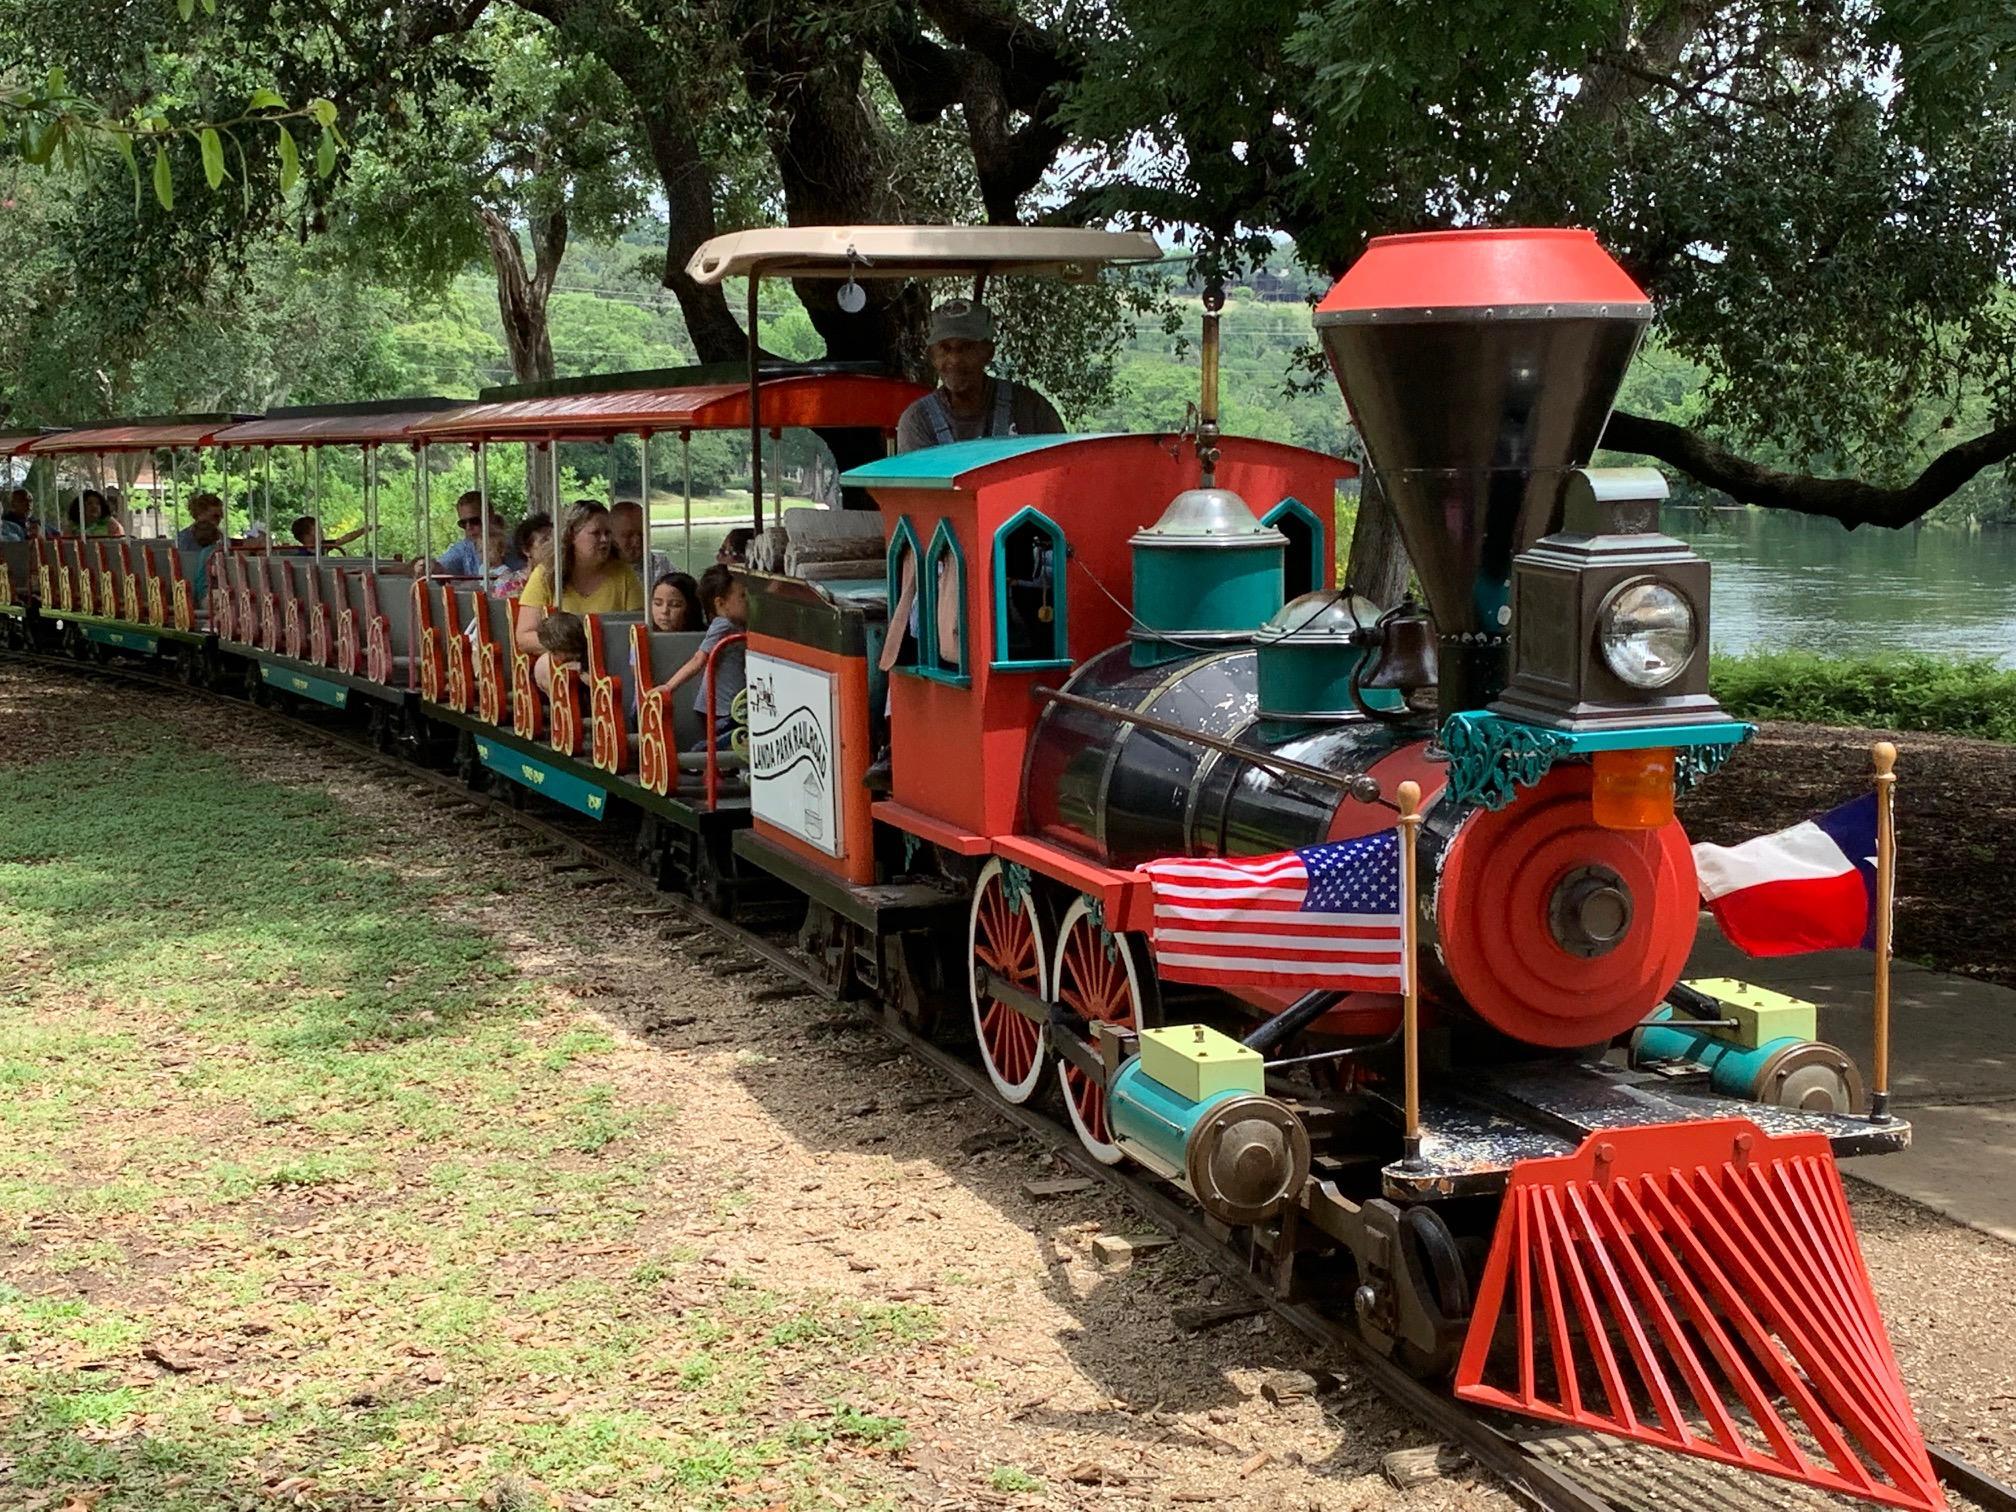 The train through Landa Park is popular with children.